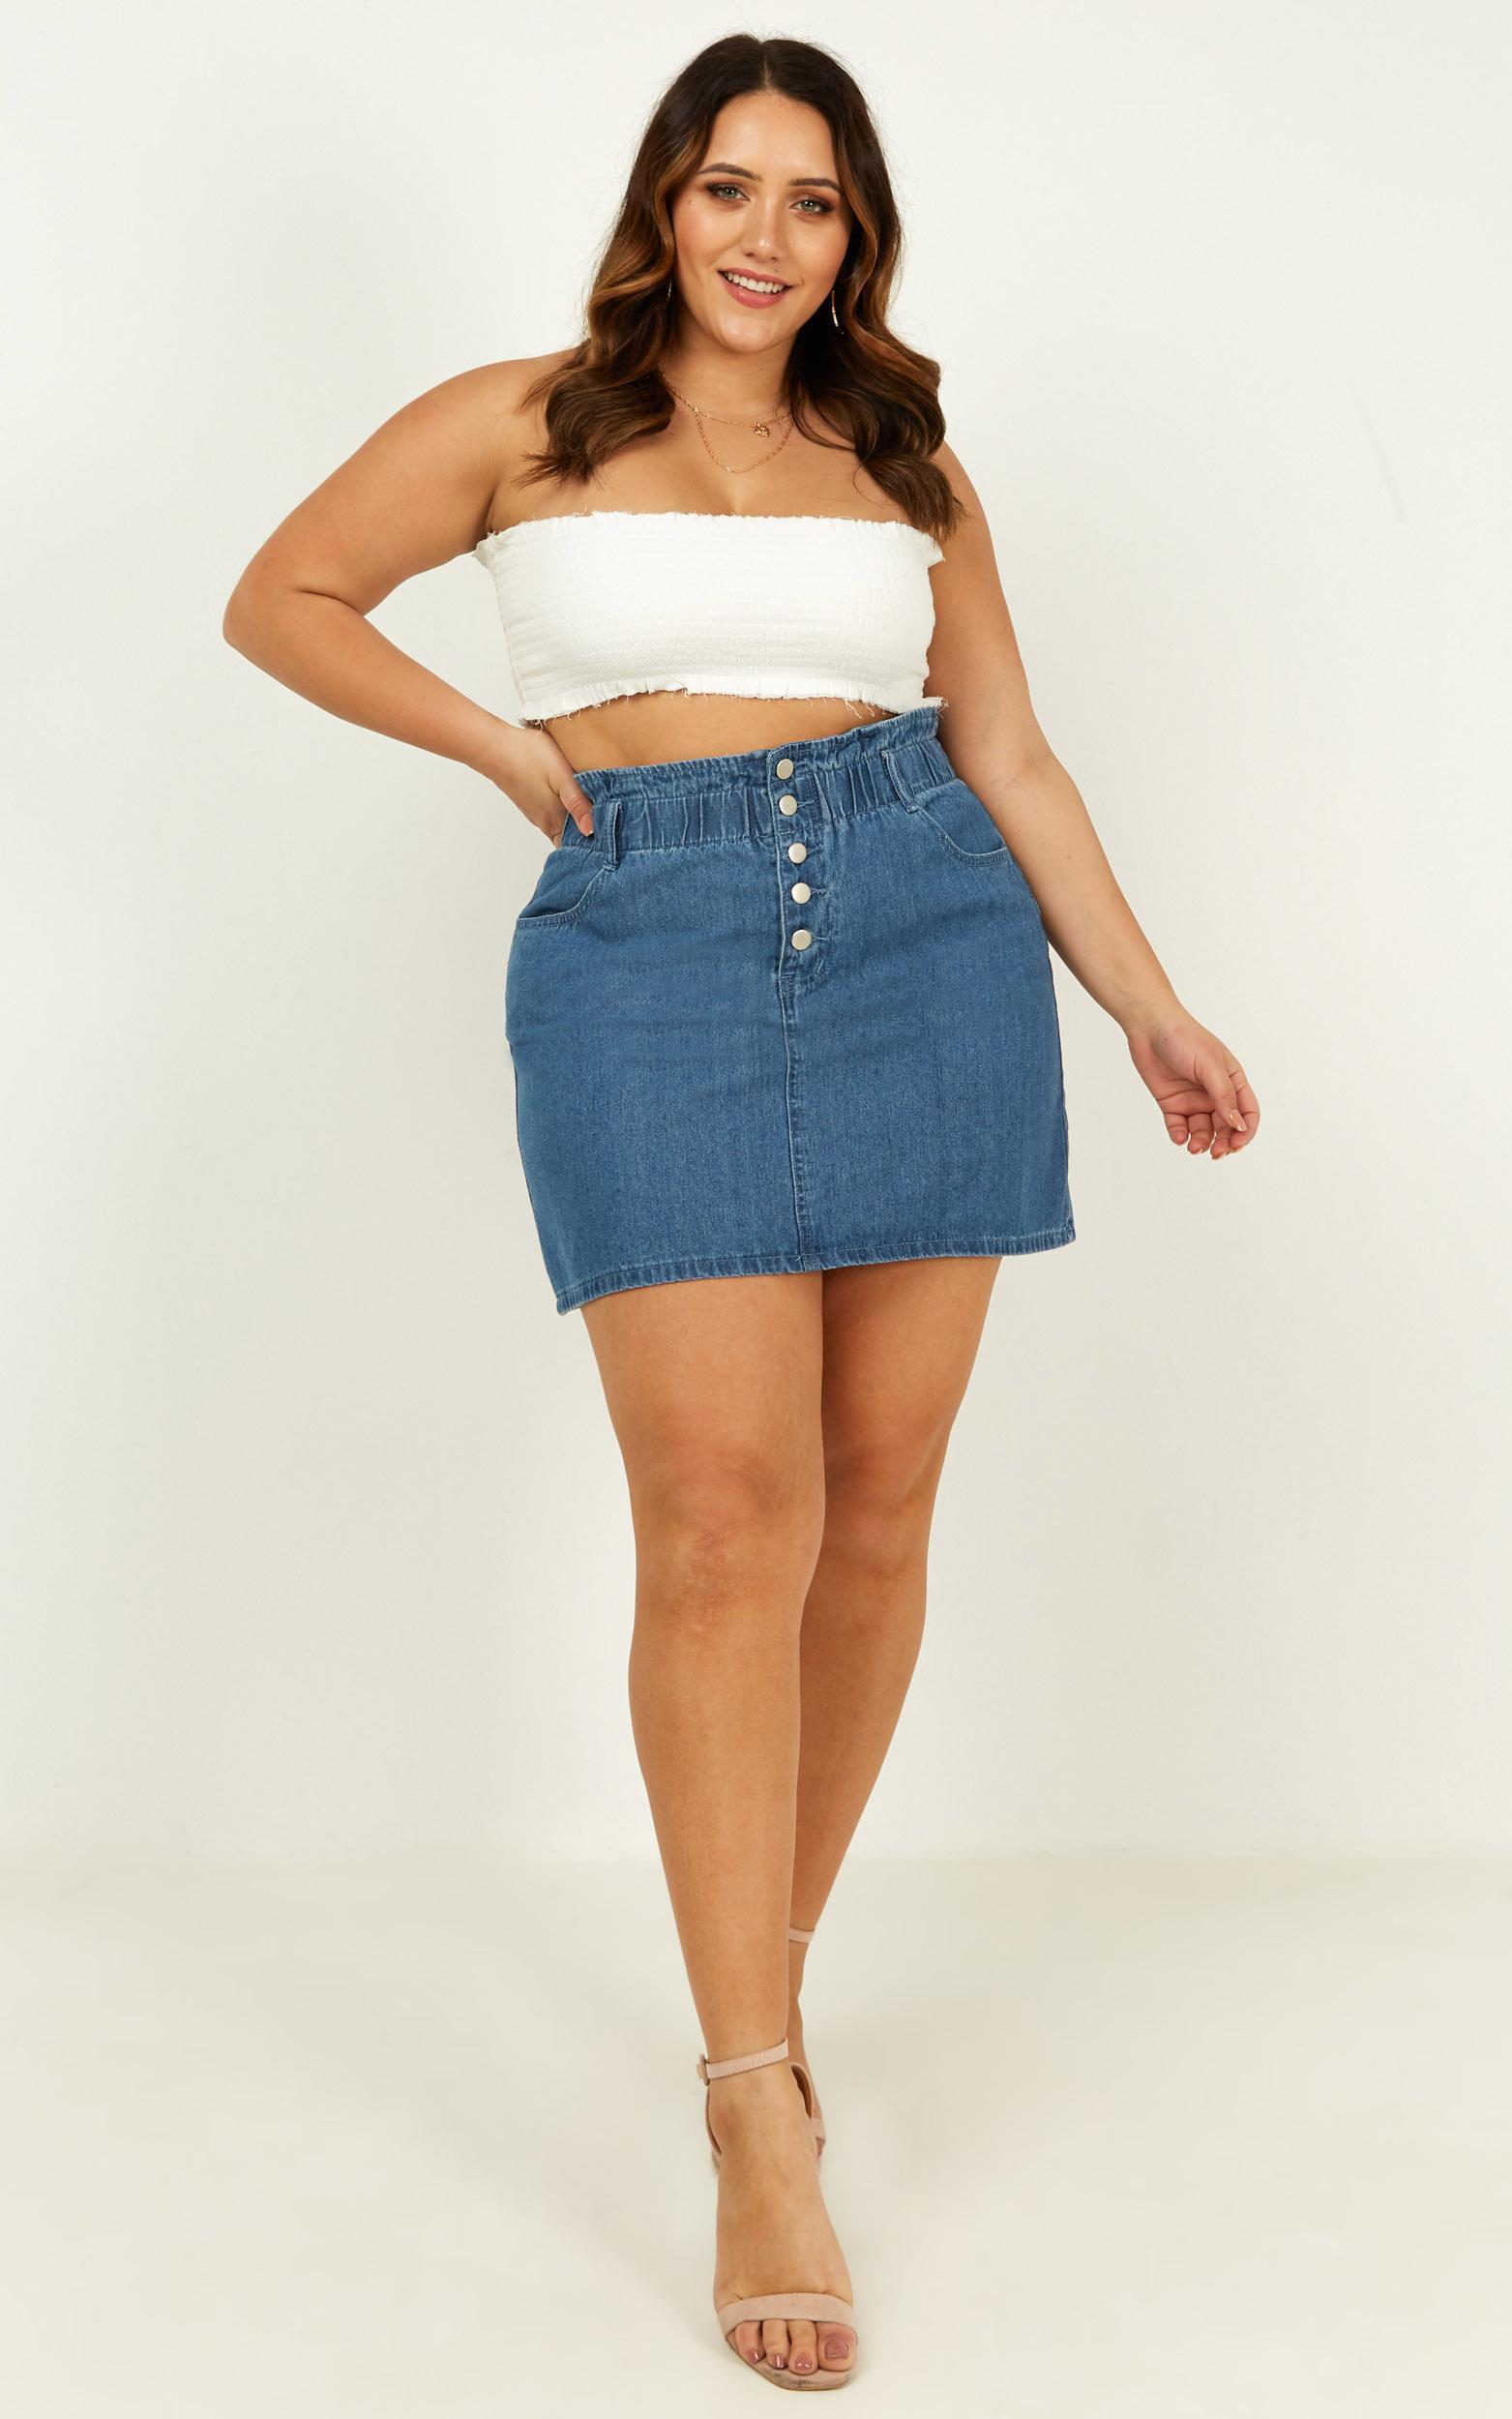 Shes Done Denim skirt in dark wash - 14 (XL), Blue, hi-res image number null